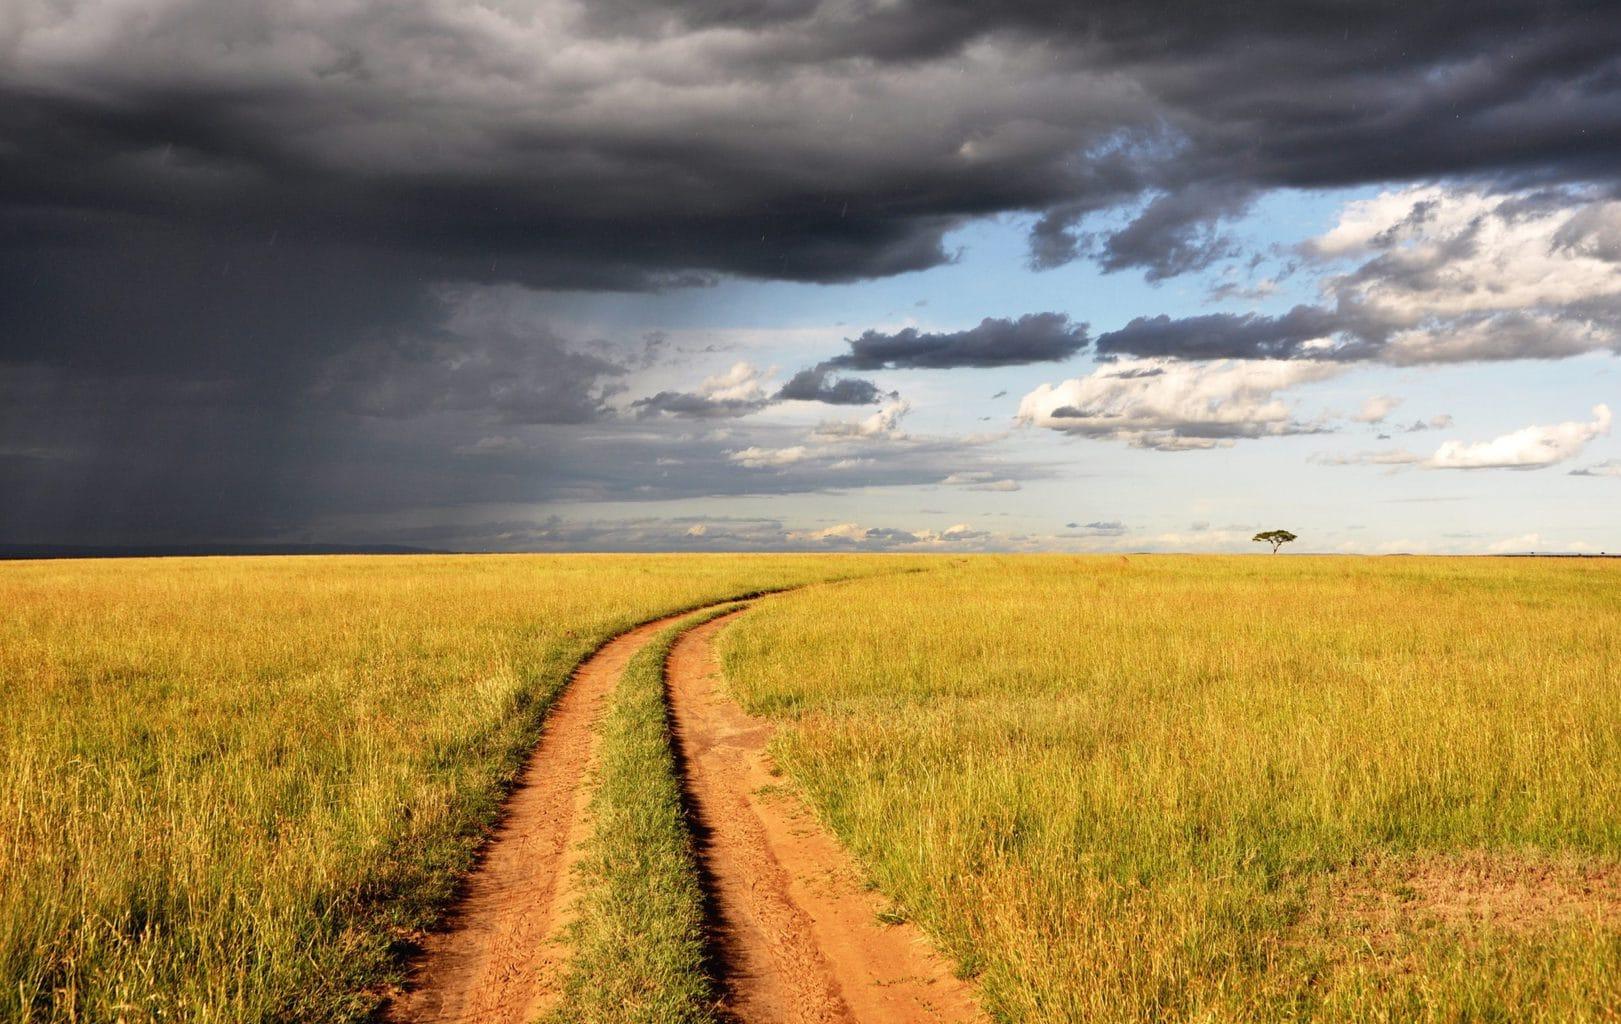 Camino con tormenta al fondo